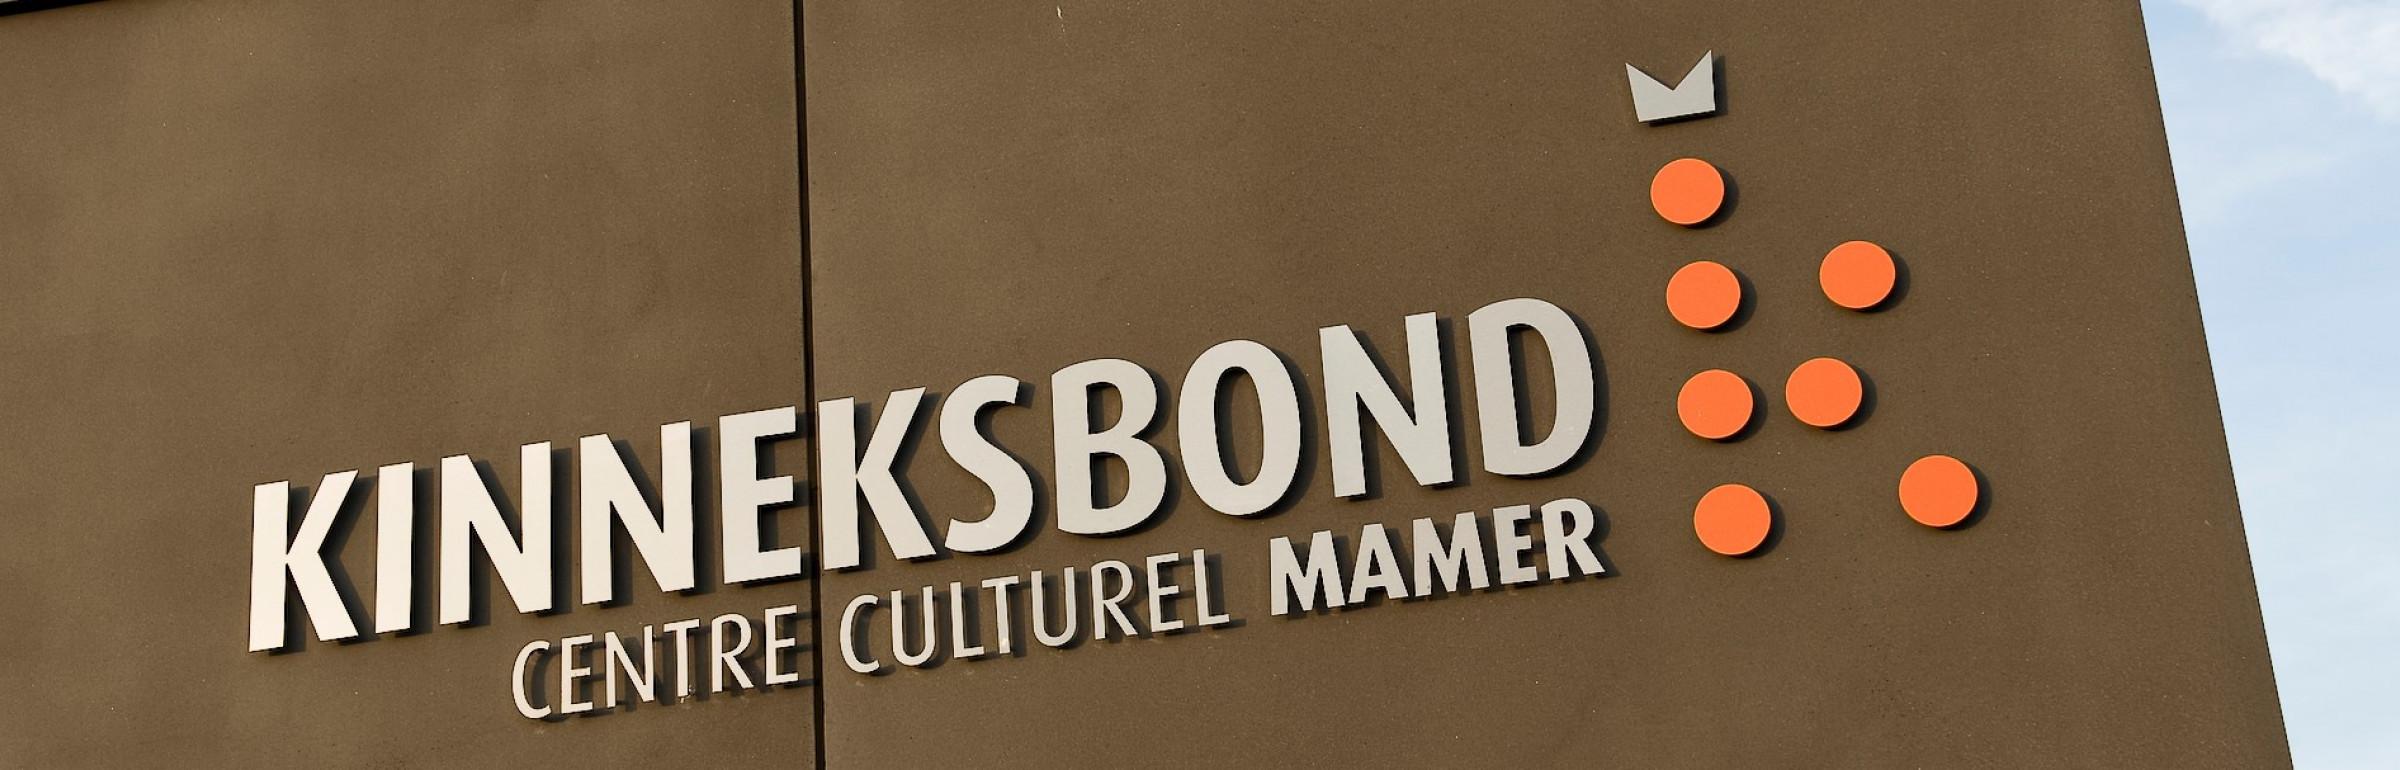 Banner Kinneksbond, Centre Culturel Mamer